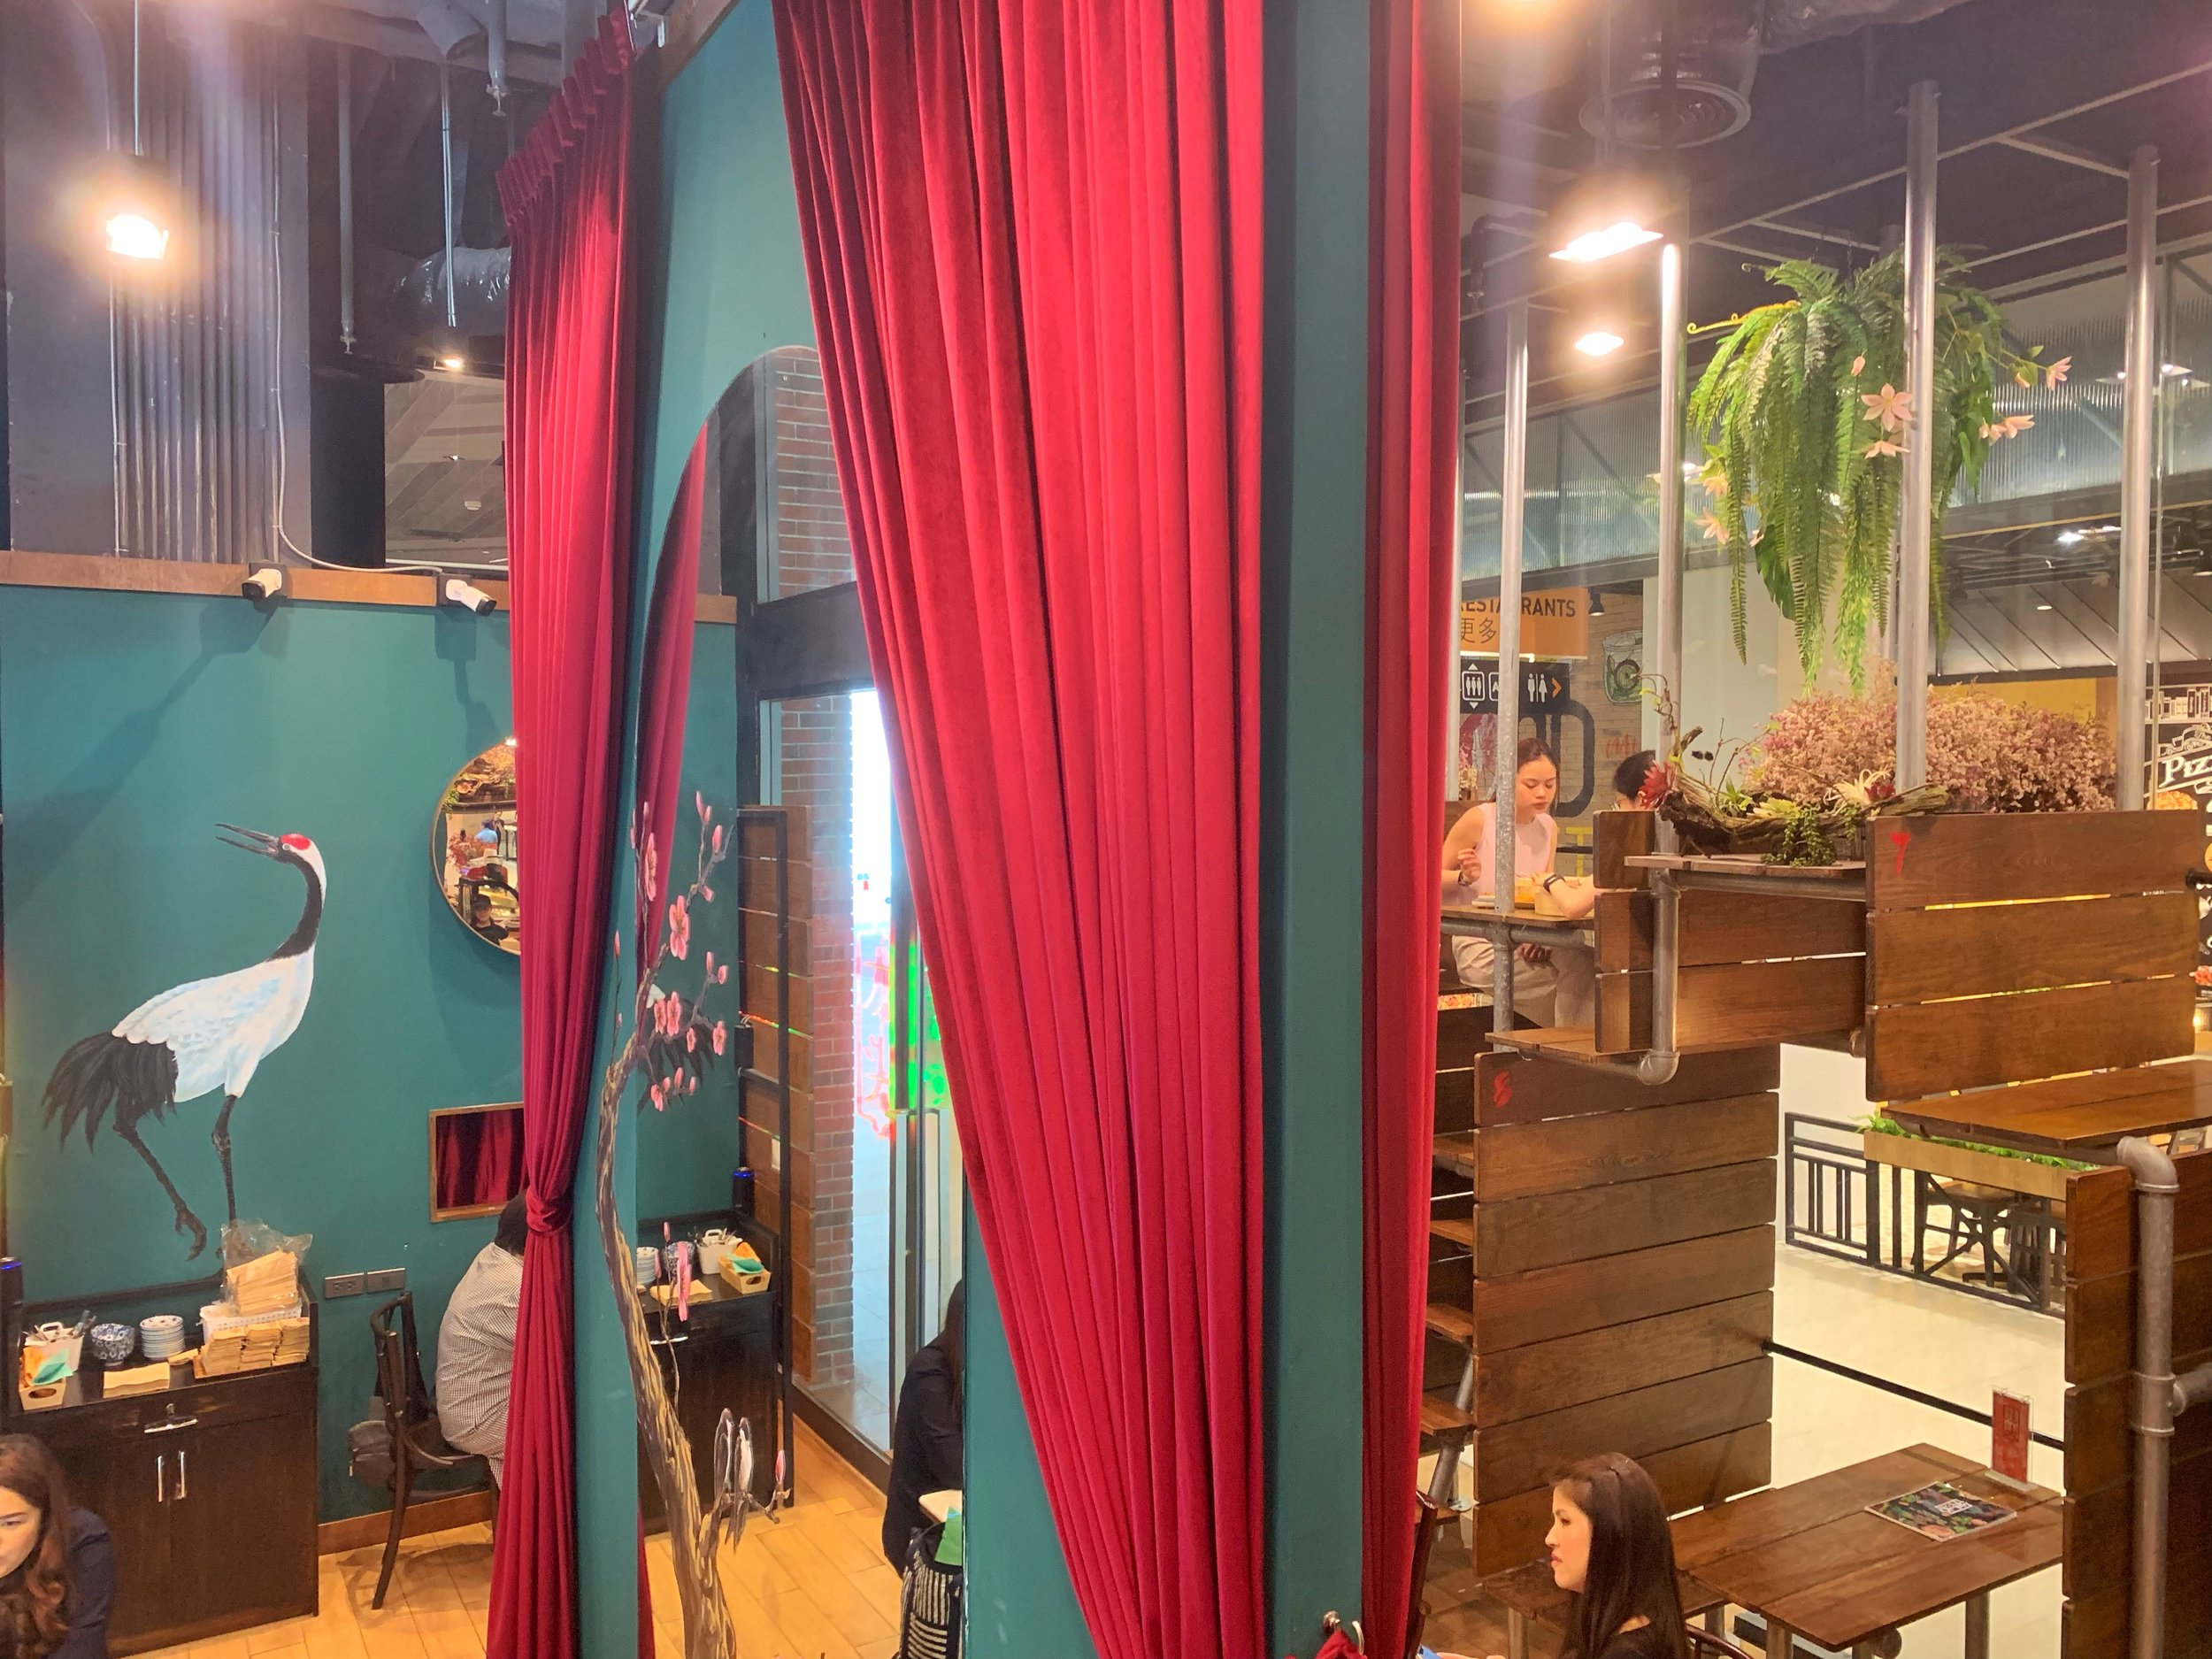 lhongtou cafe bangkok thailand the market